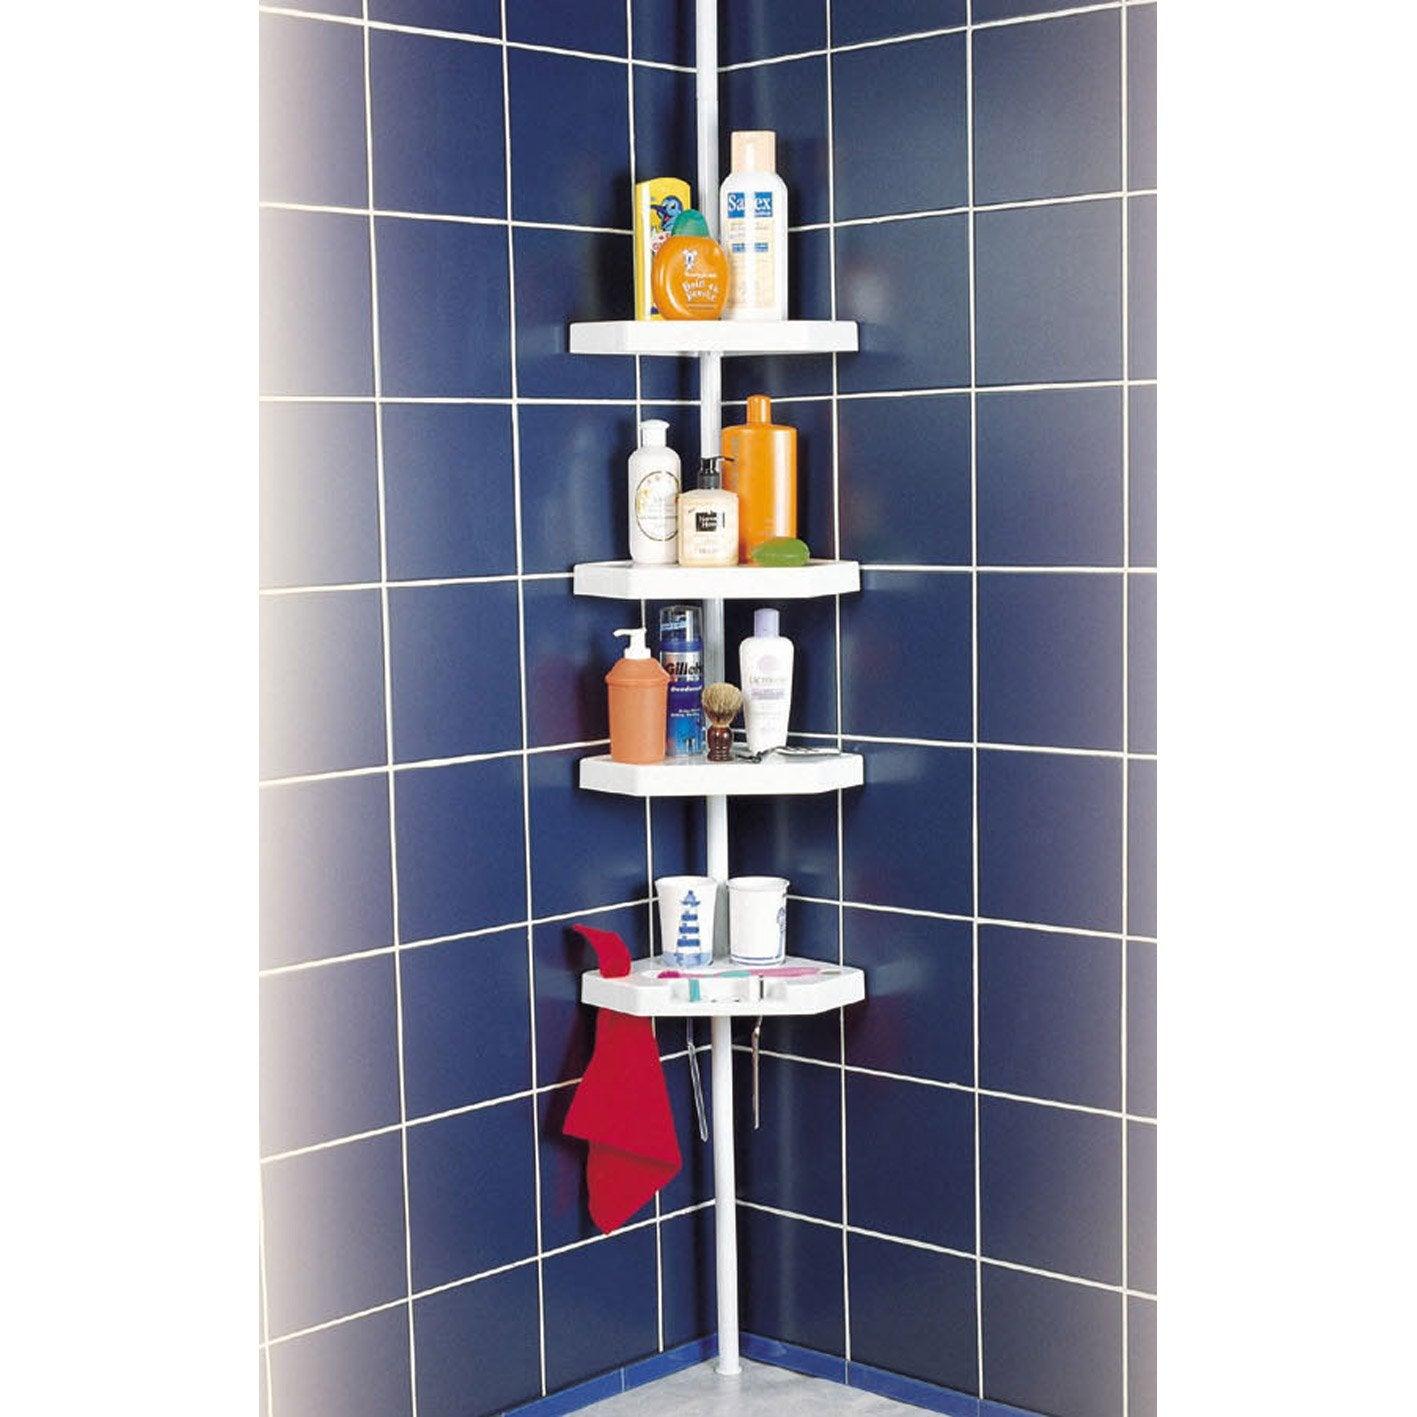 Comment monter etagere d angle salle de bain gifi salle - Baignoires douches leroy merlin ...